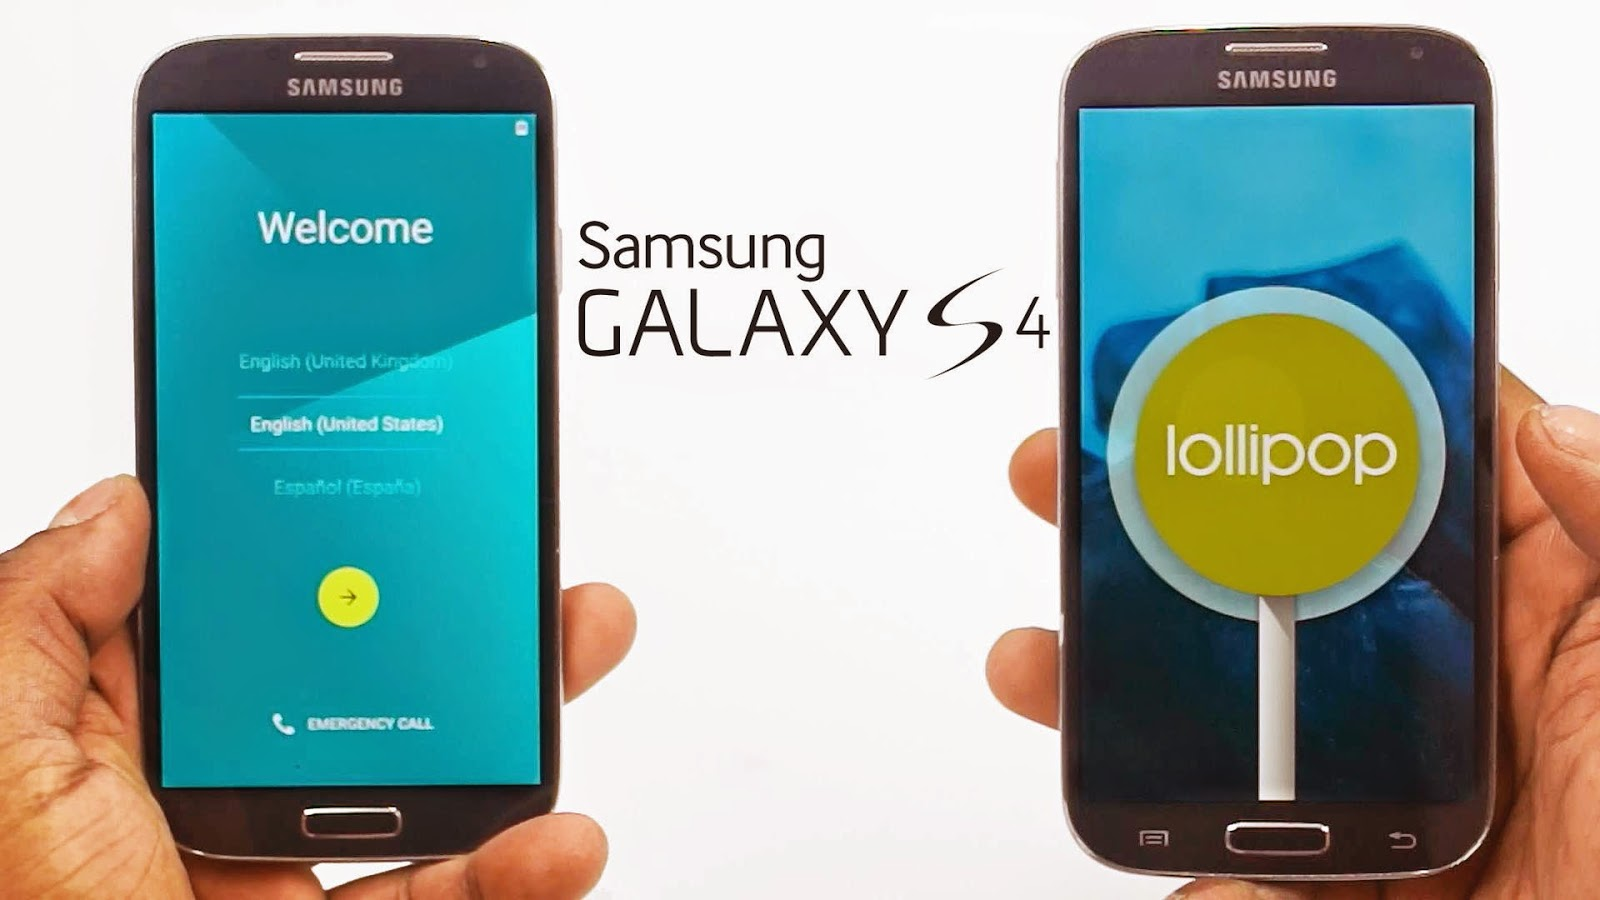 Actualización de Samsung Galaxy S4 a Android 5.0 Lollipop